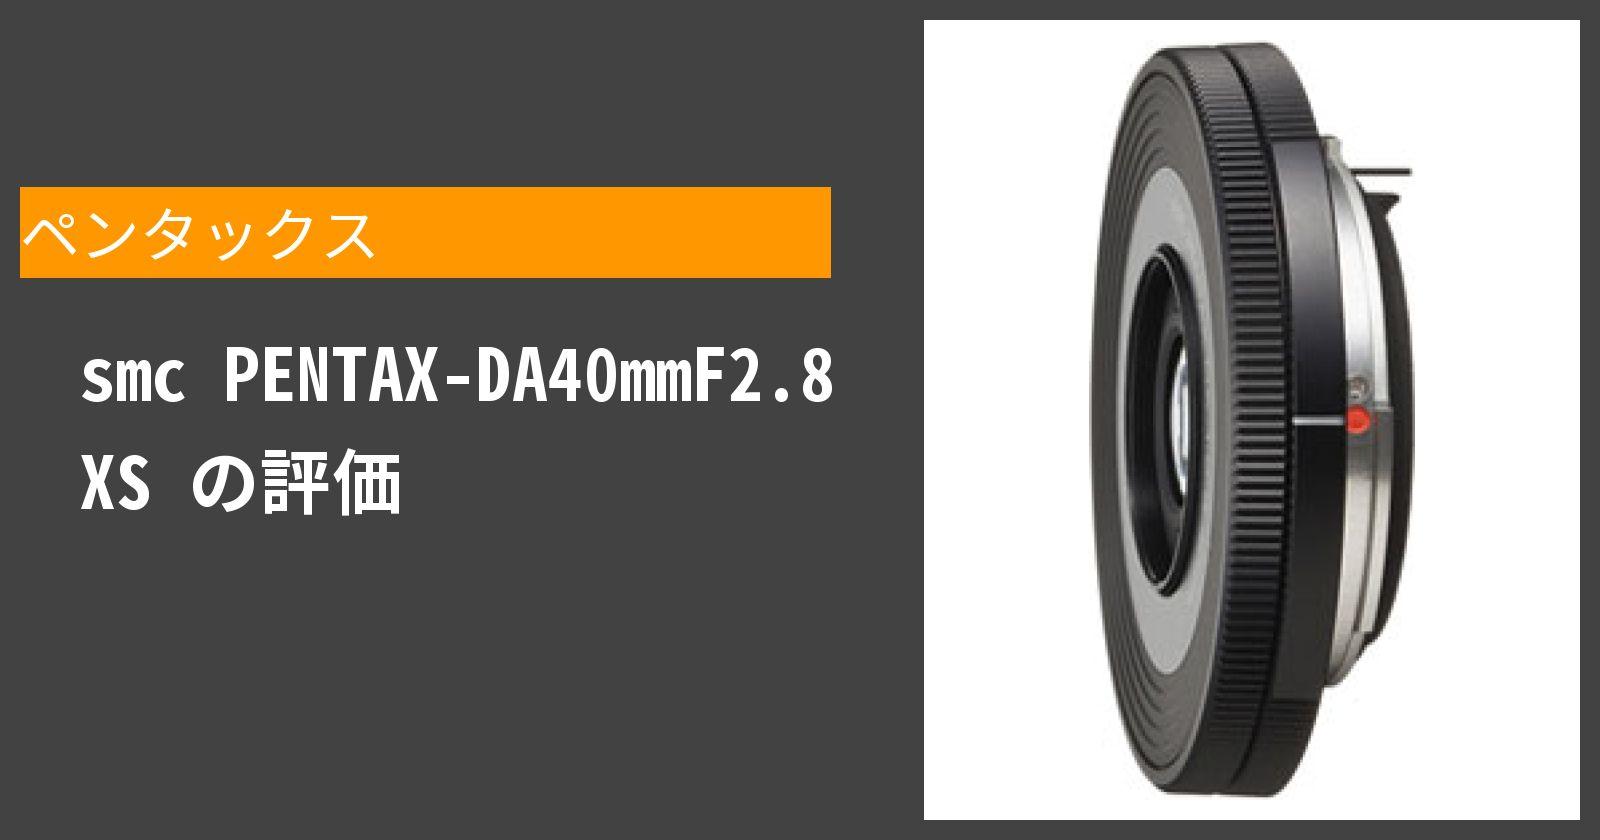 smc PENTAX-DA40mmF2.8 XSを徹底評価